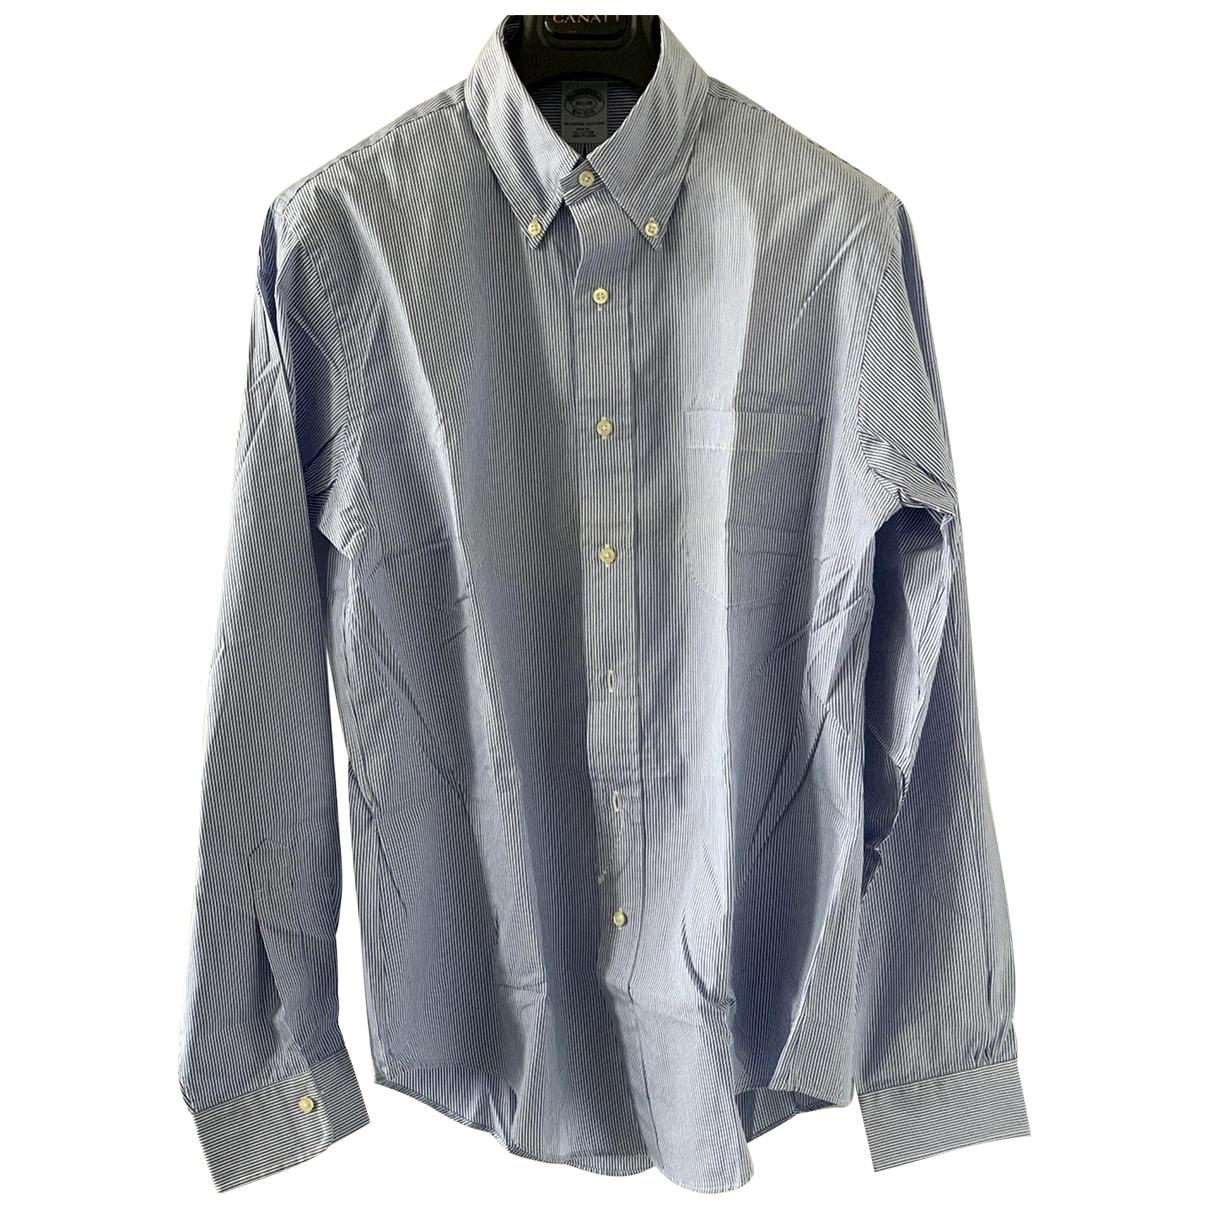 Brooks Brothers \N Blue Cotton Shirts for Men 15.5 UK - US (tour de cou / collar)